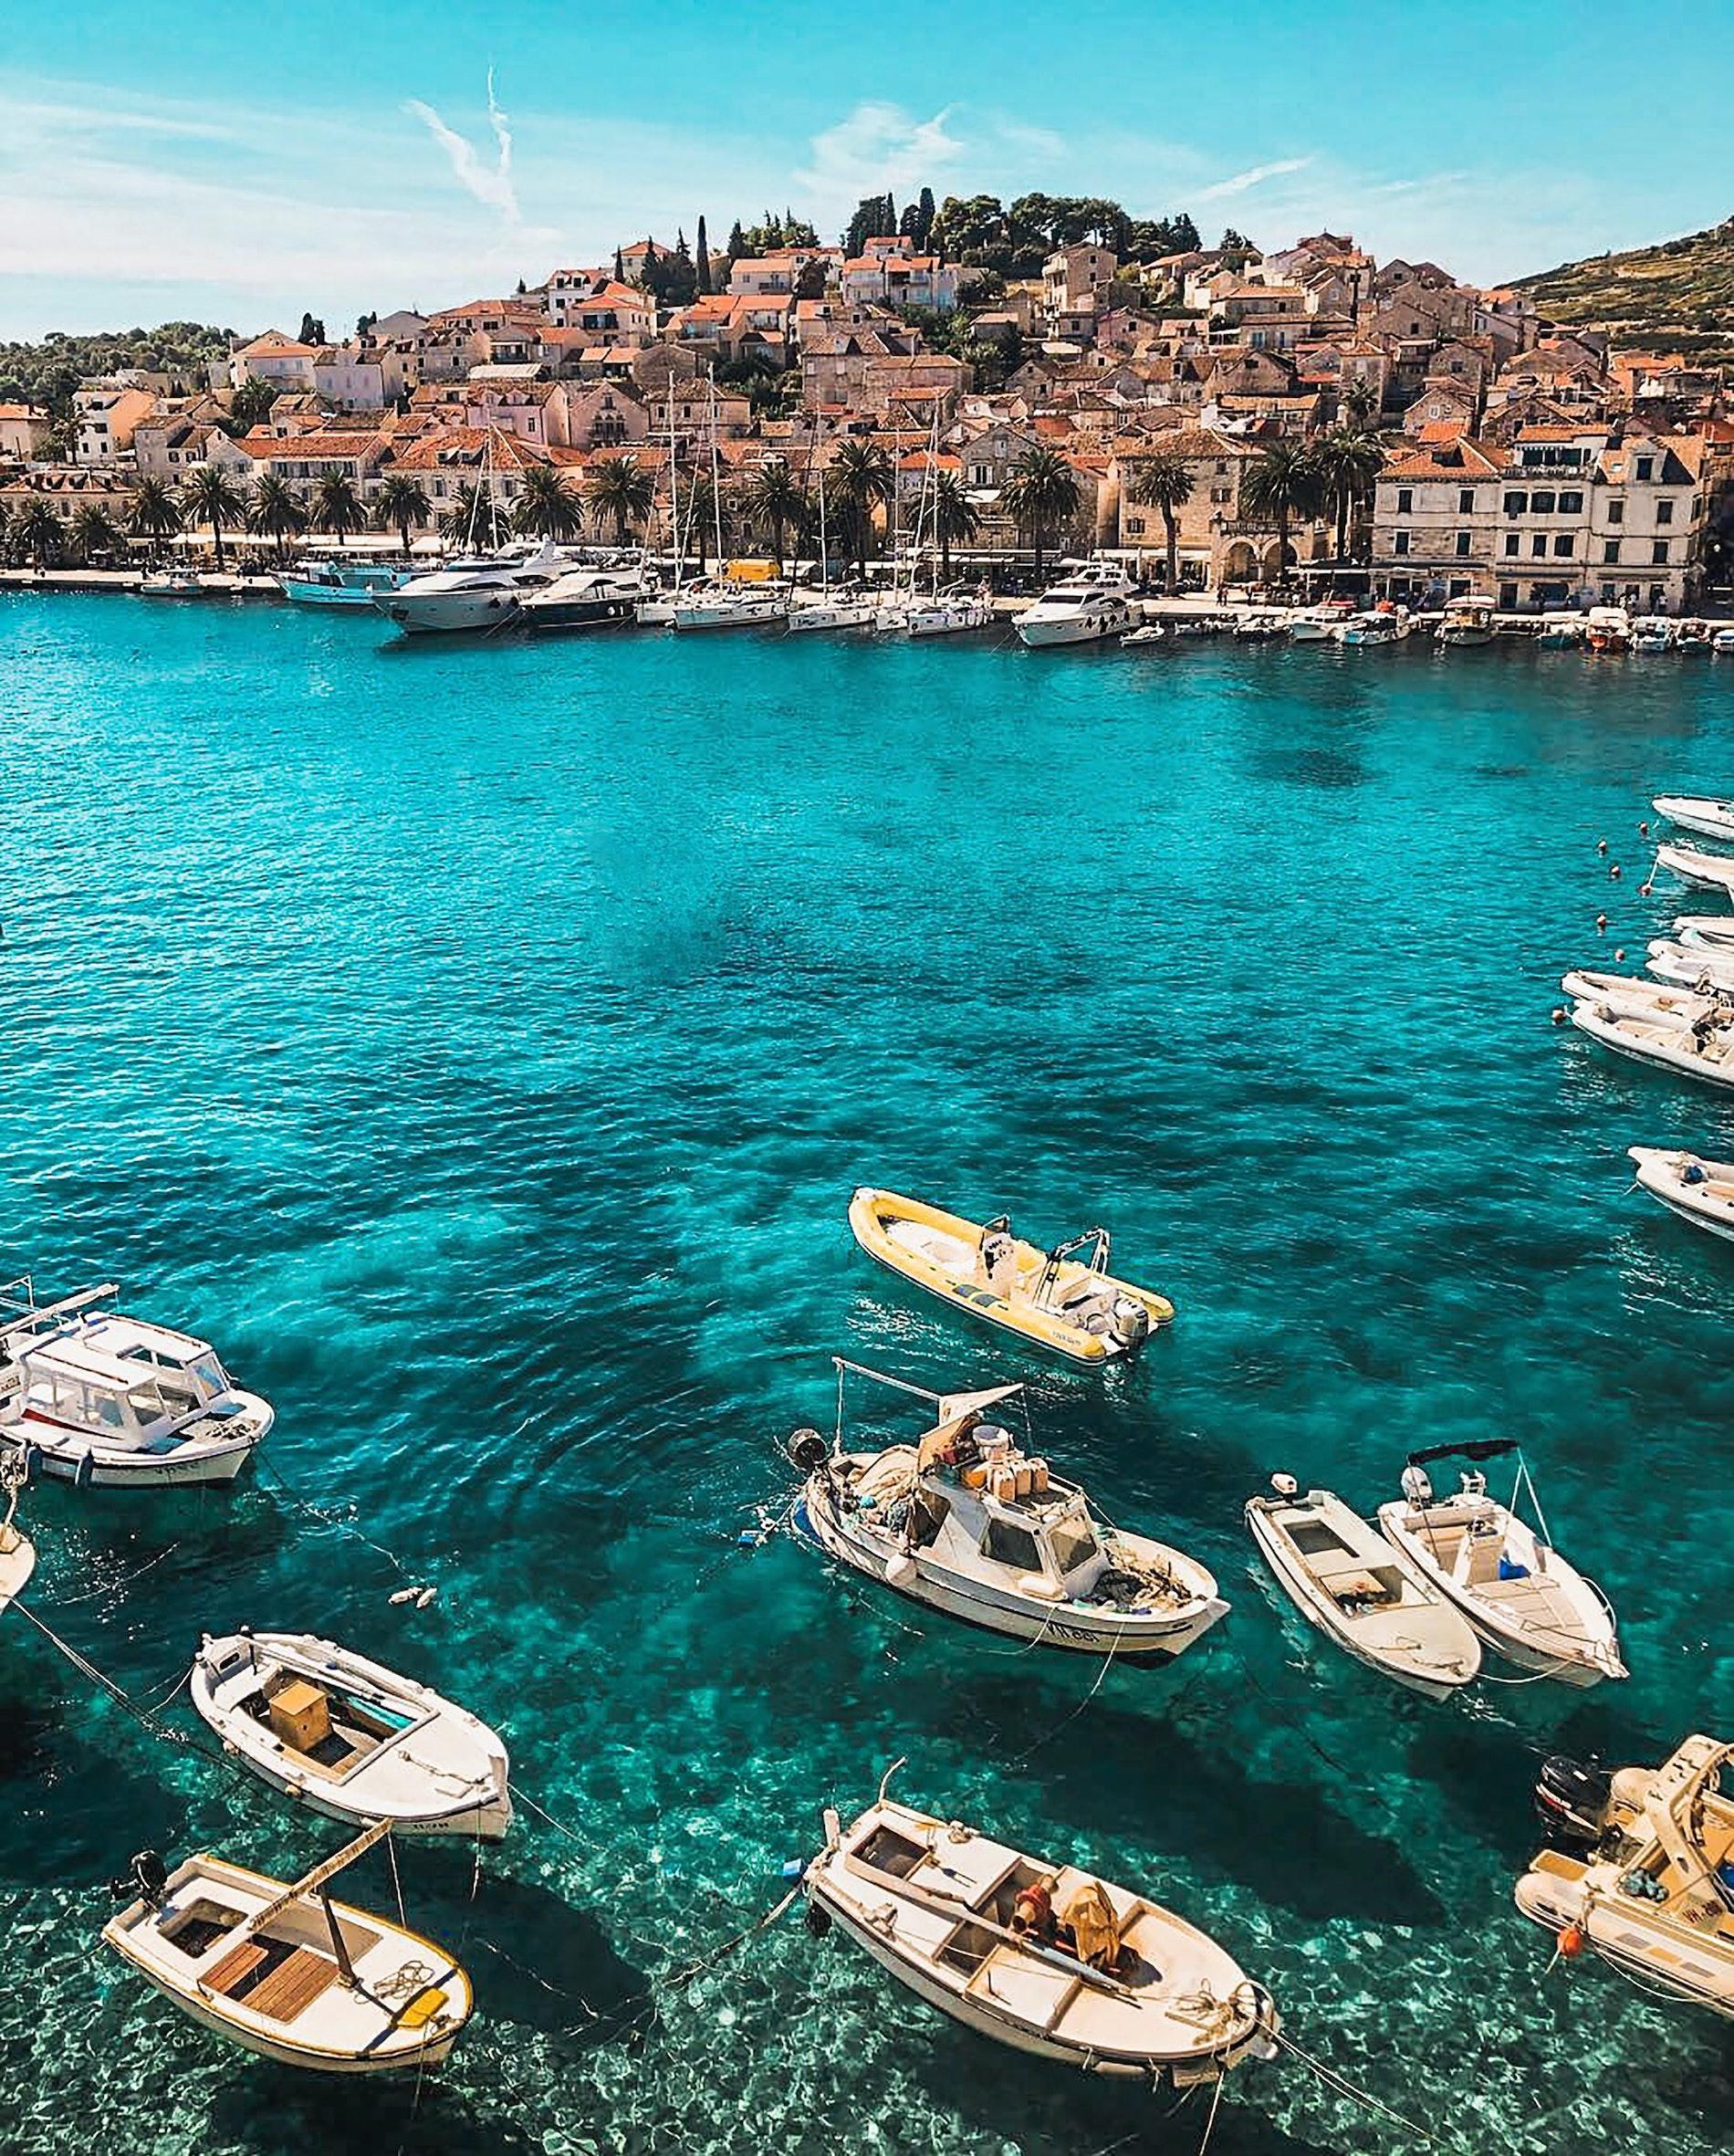 Virushepatitis - Am Meer in einem Hafen